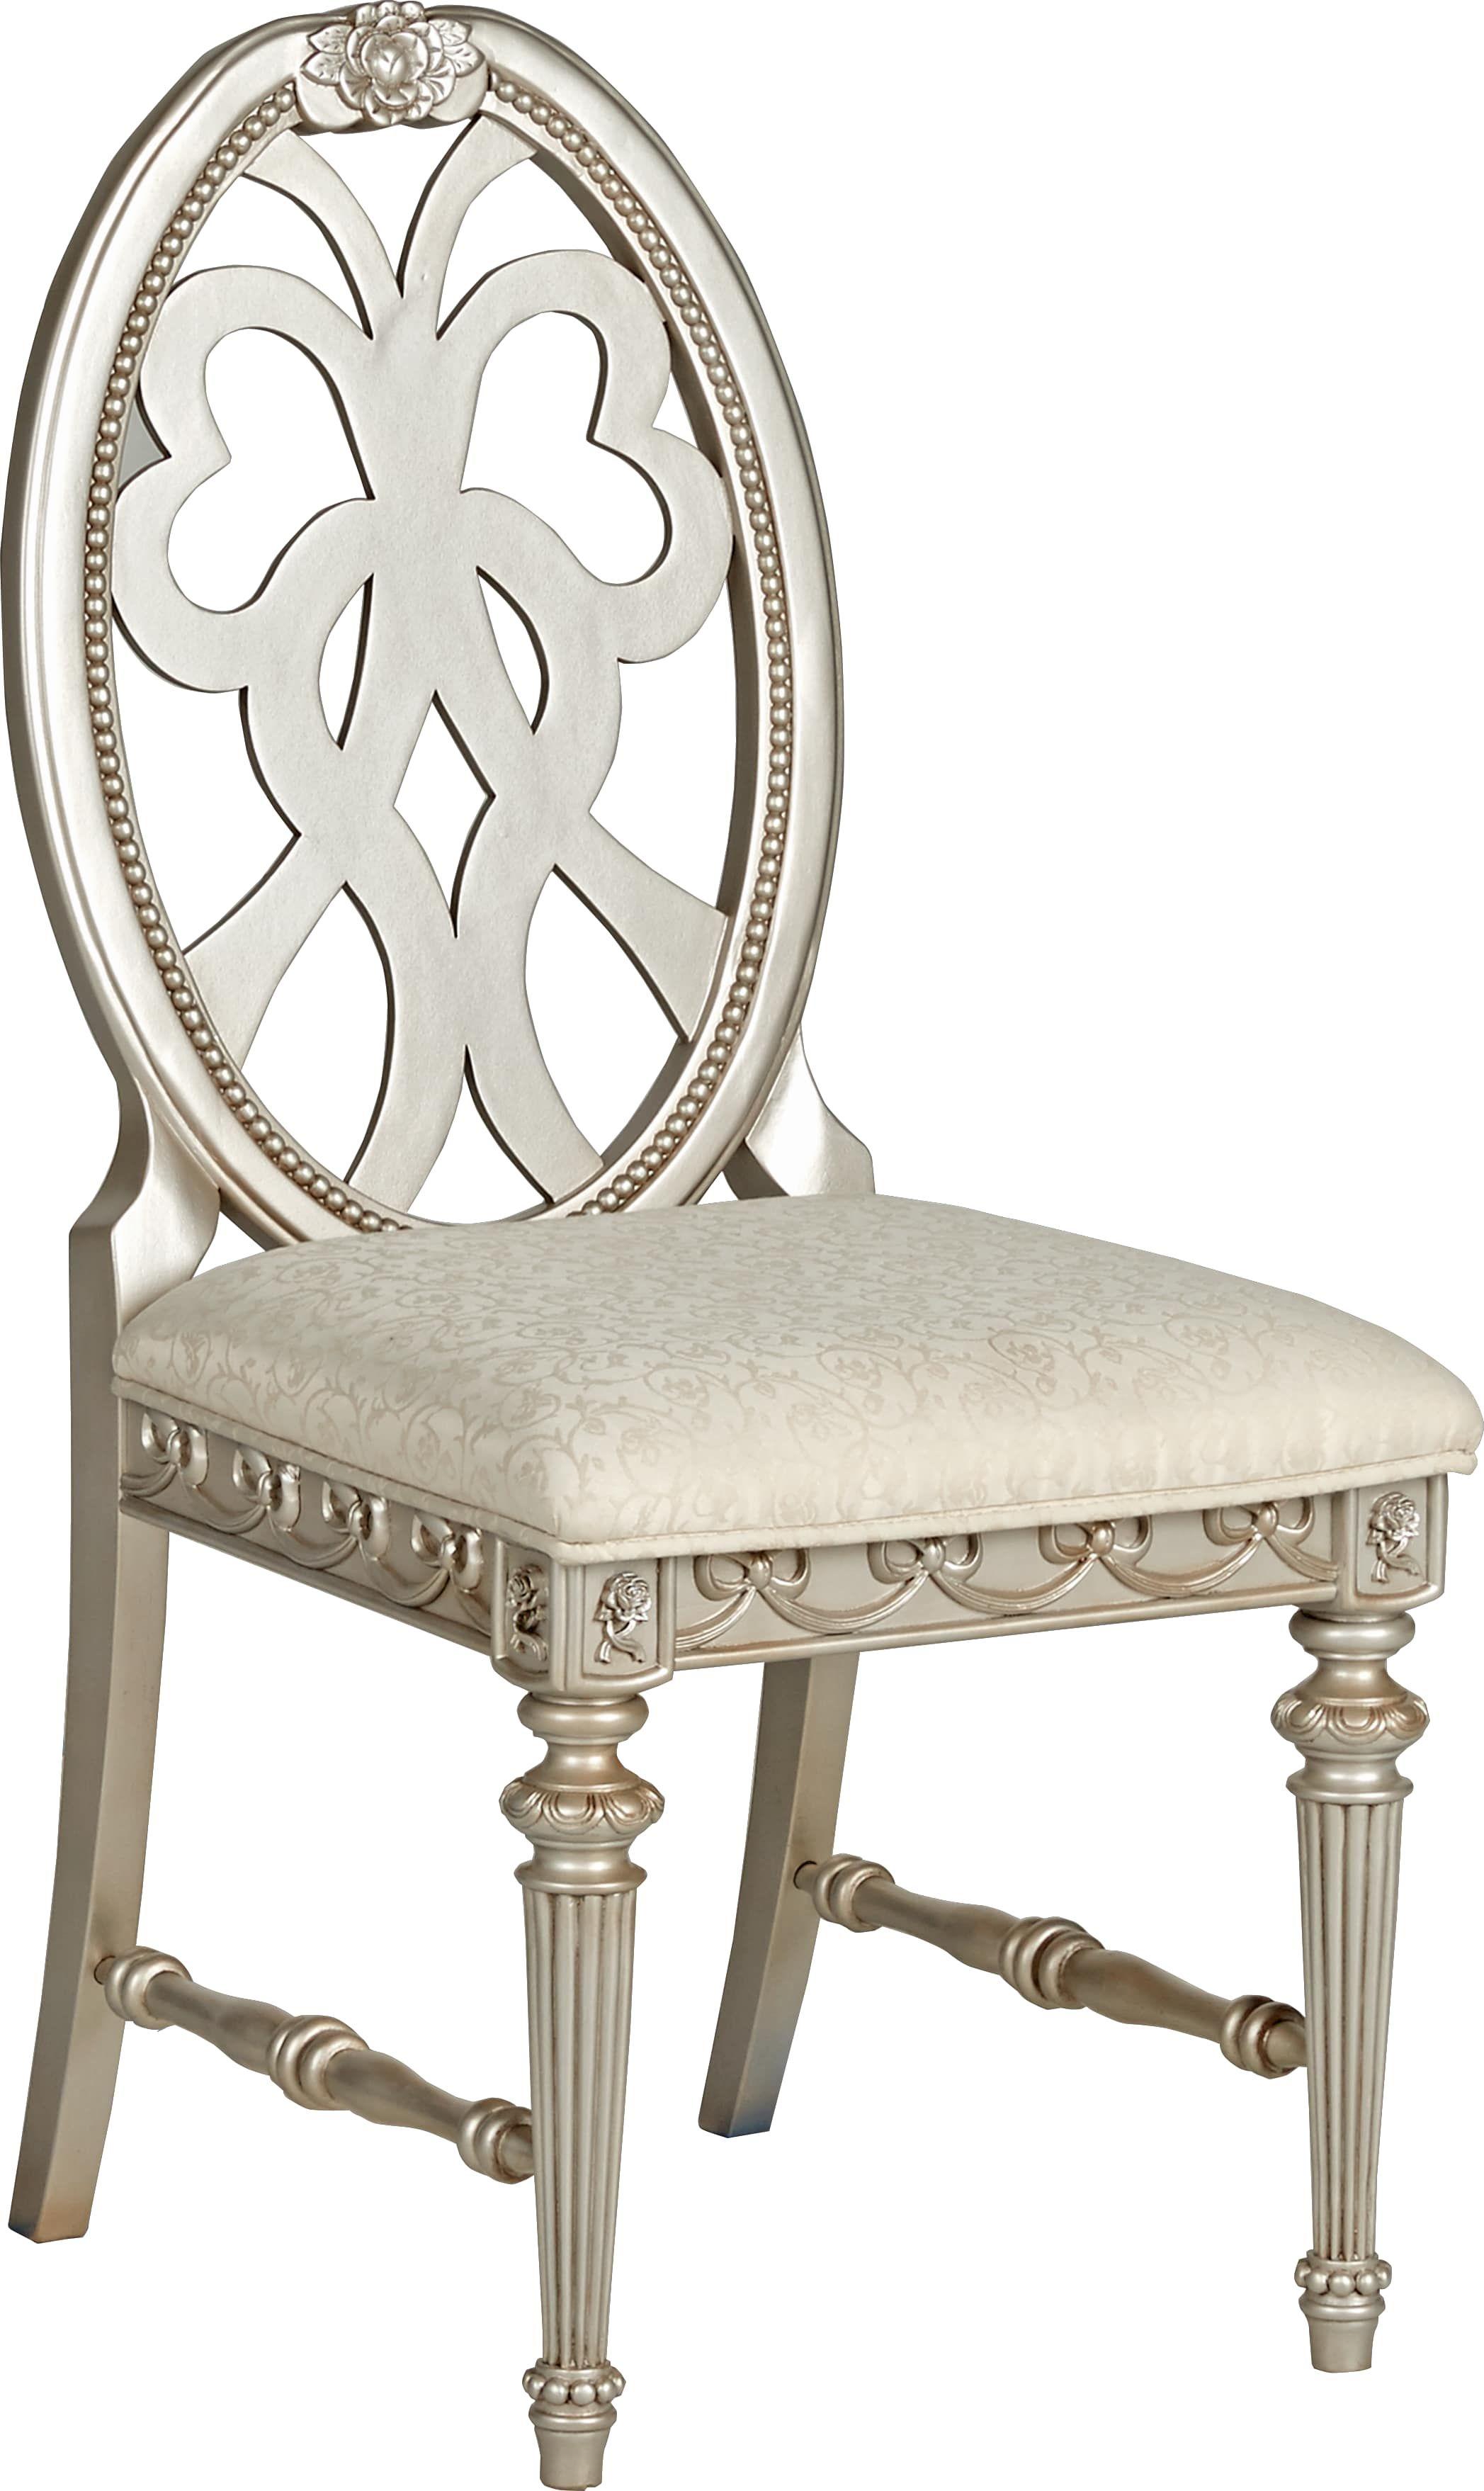 Disney princess silver desk chair chair upholstered